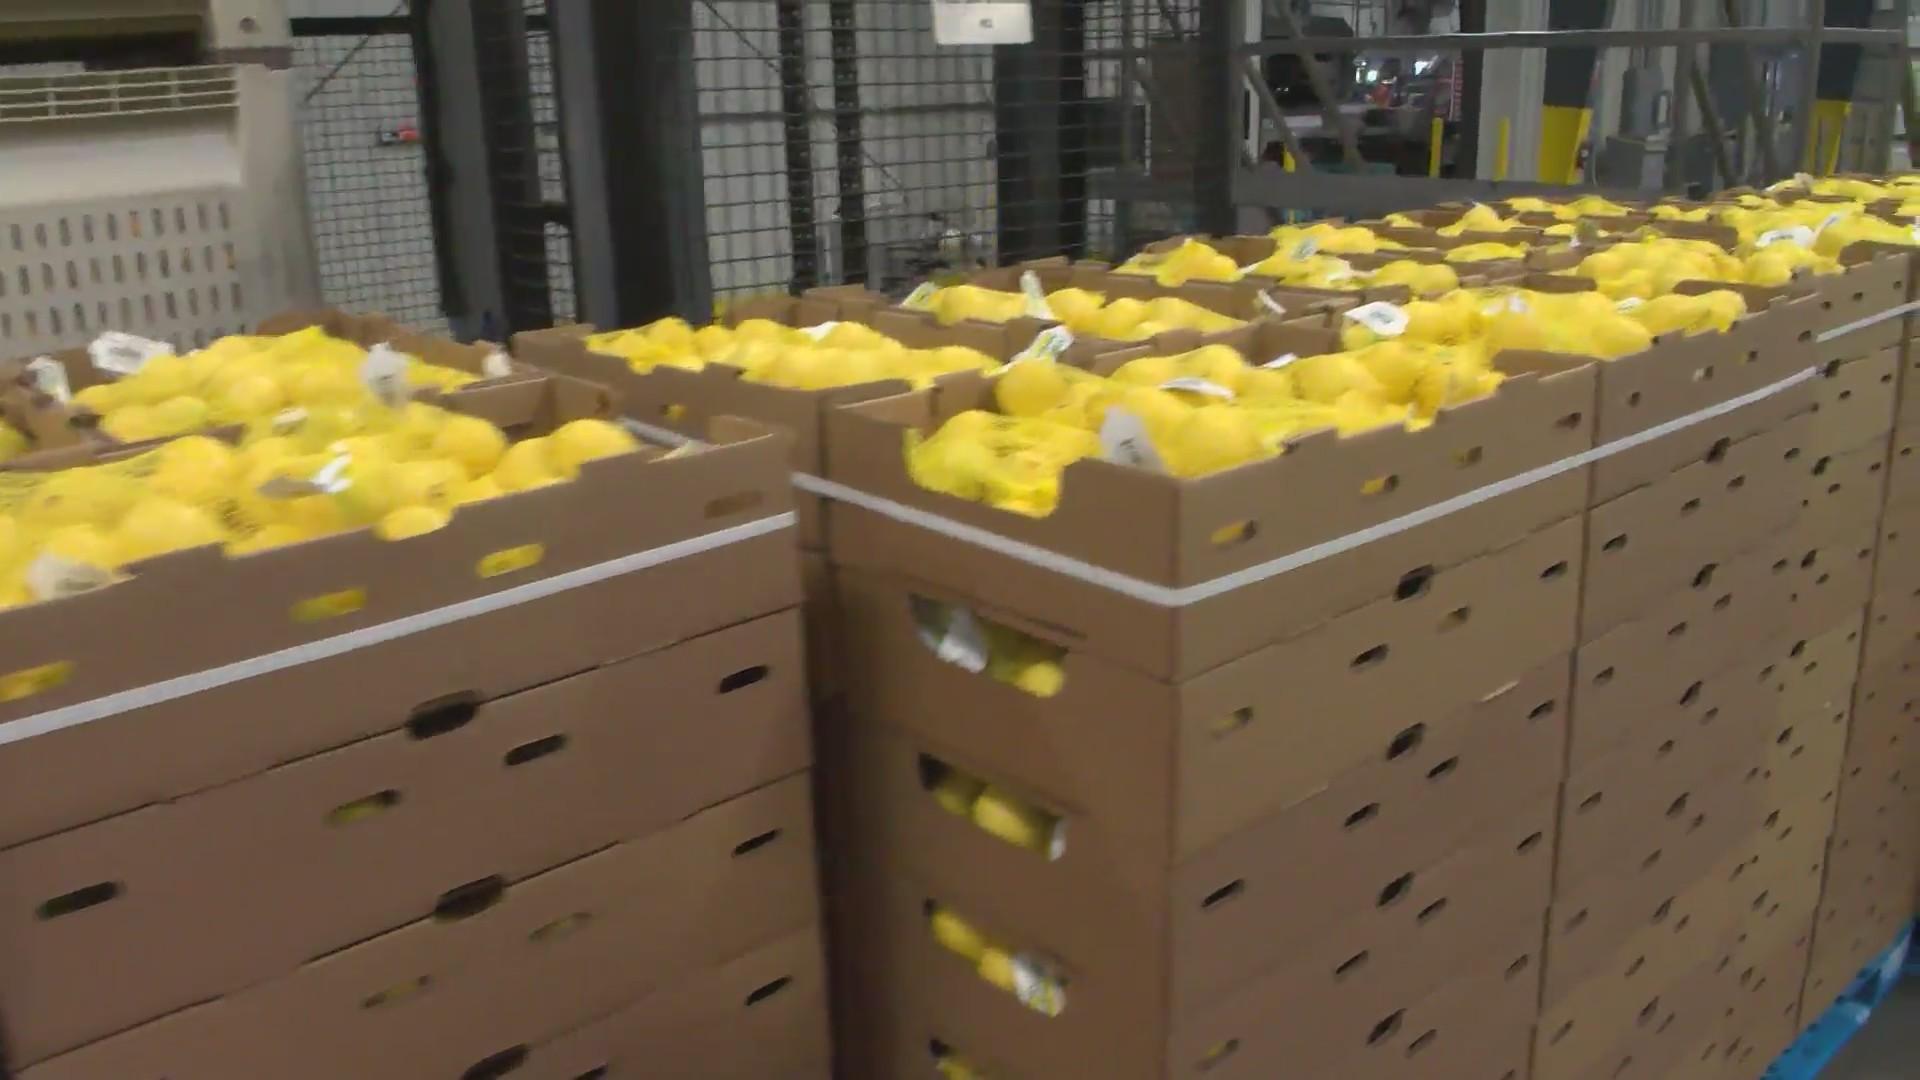 Citrus season is underway in Central California